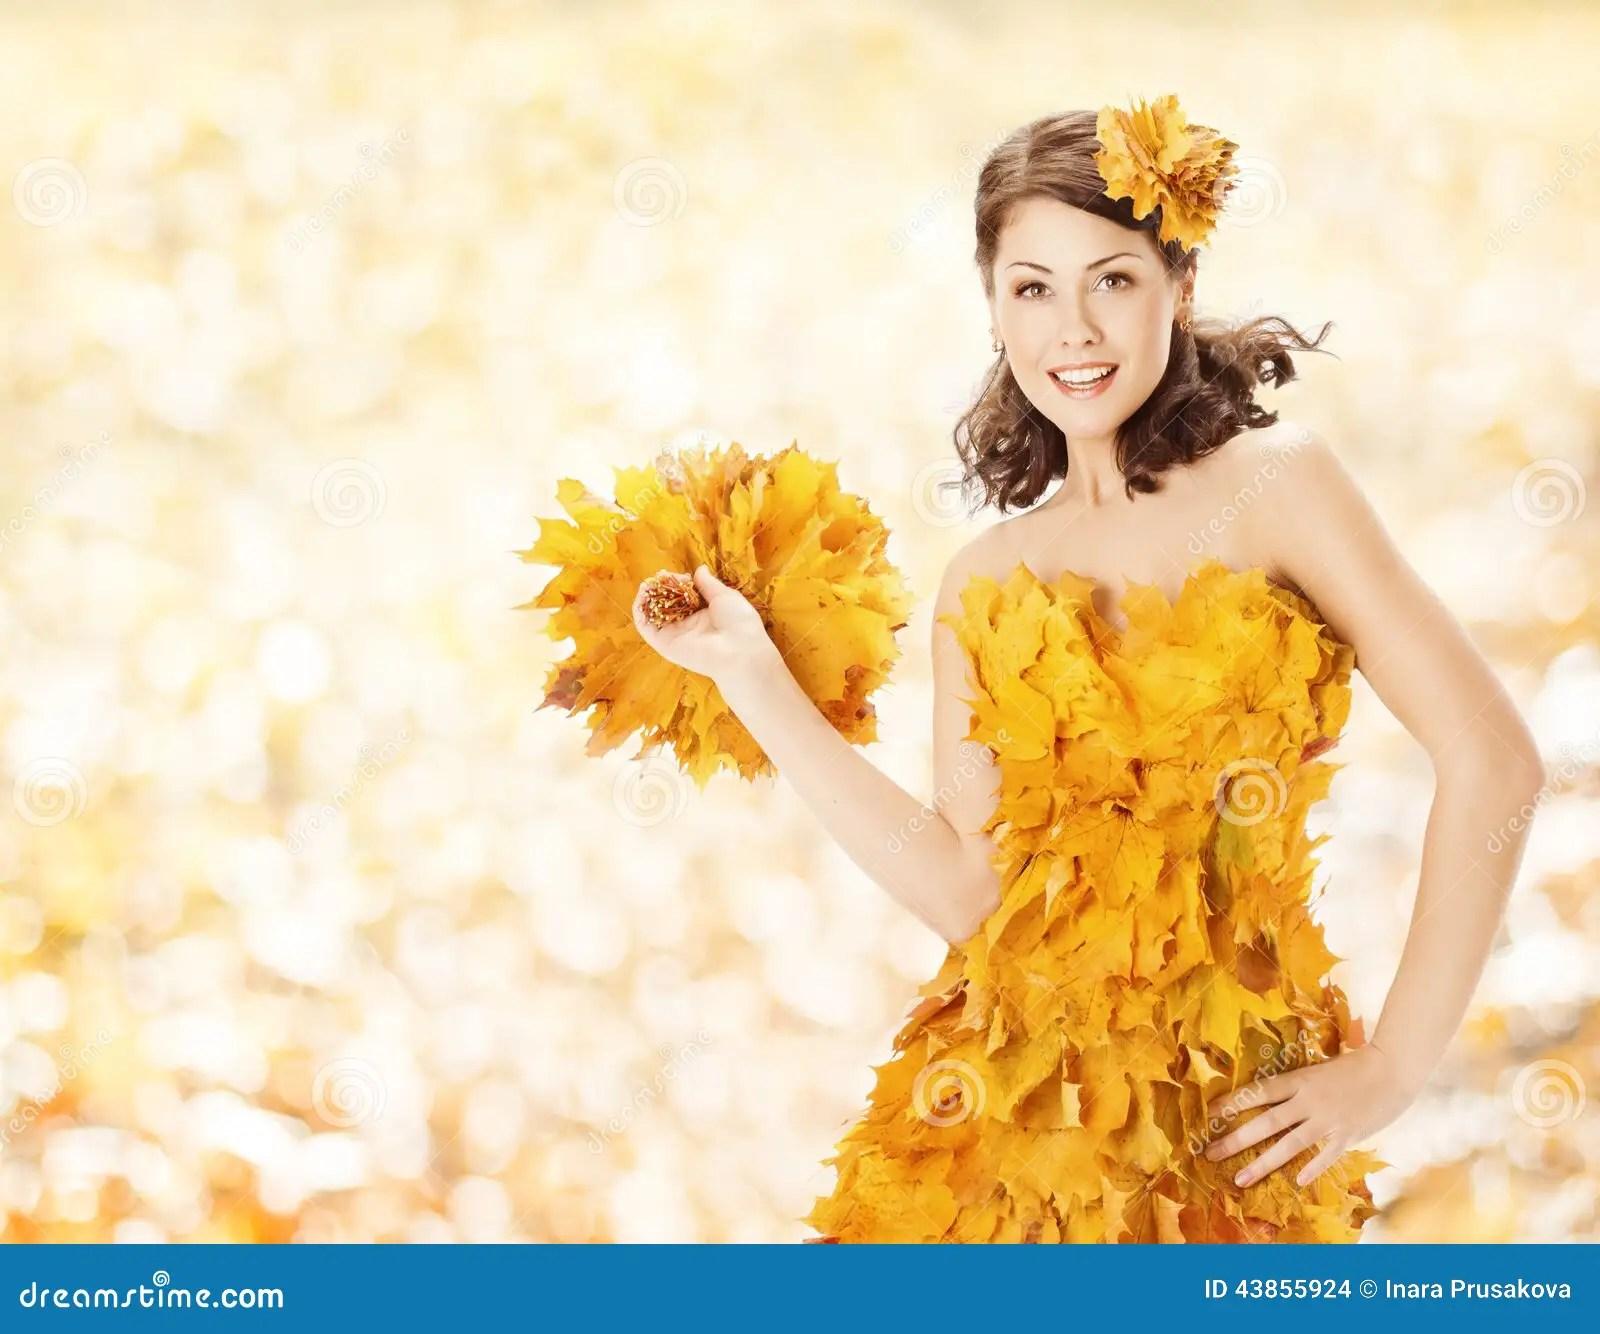 Beautiful Expersion Girl Wallpapers Autumn Woman Leaves Dress Fall Season Fashion Stock Photo